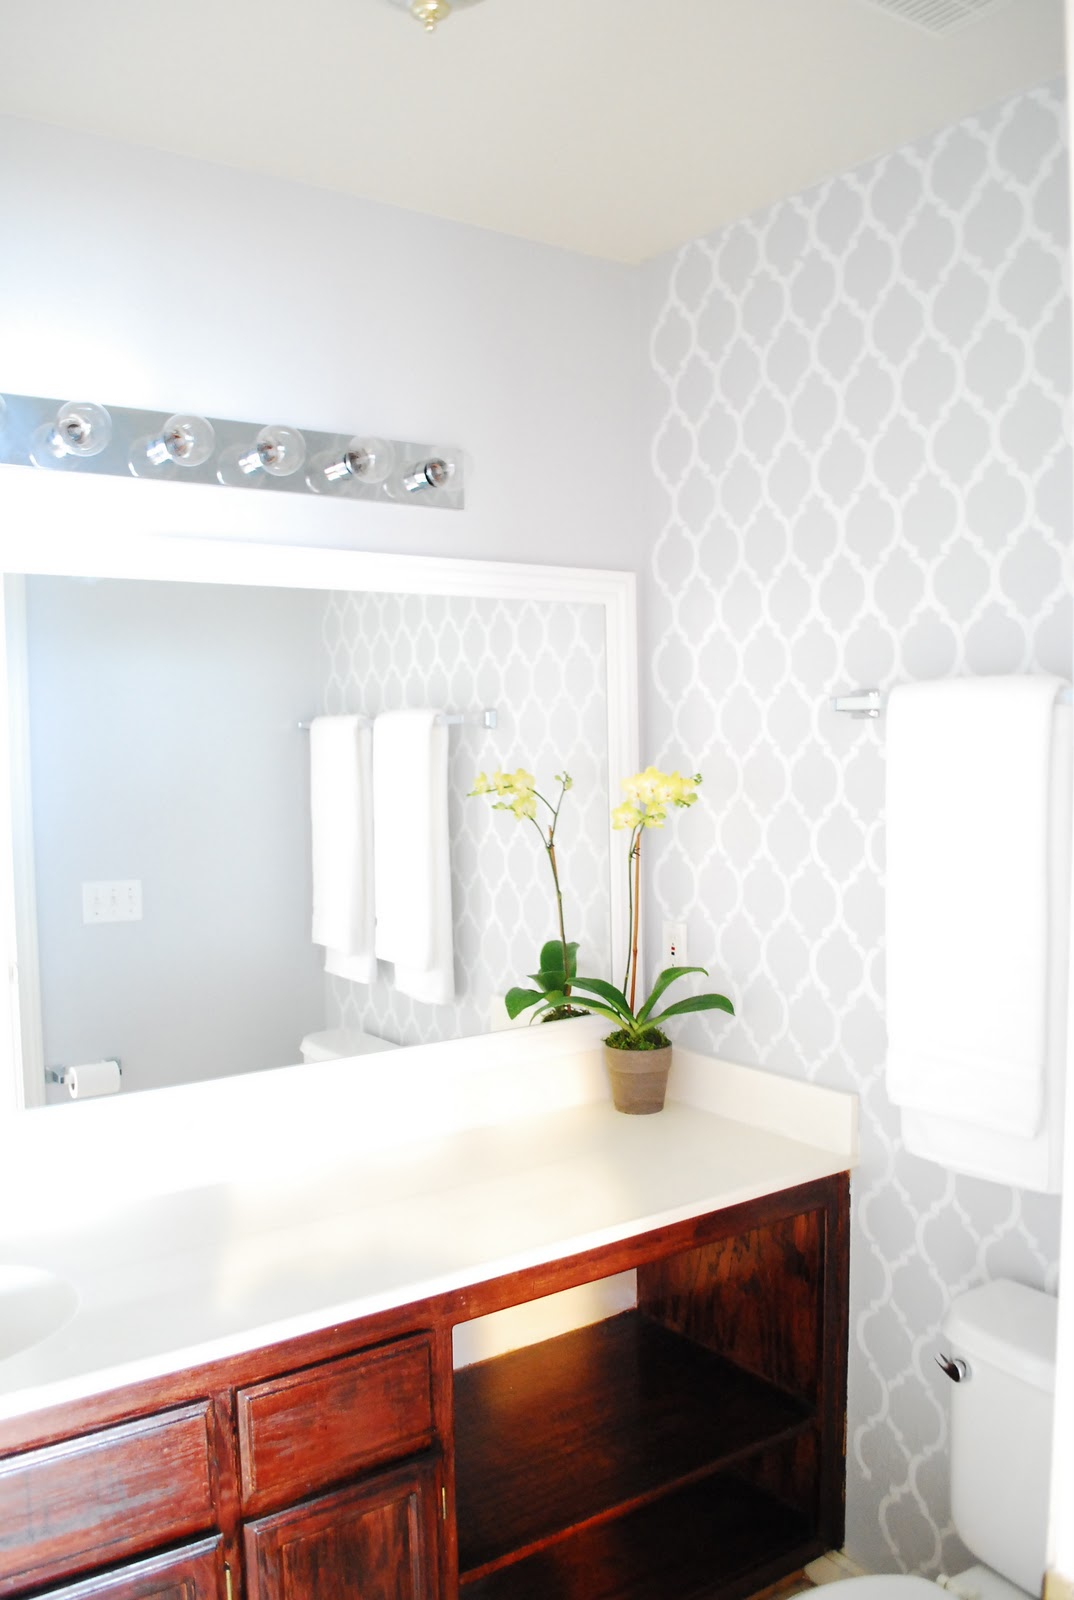 Bathroom Wall Mirrors Large: DIY Bathroom Makeover